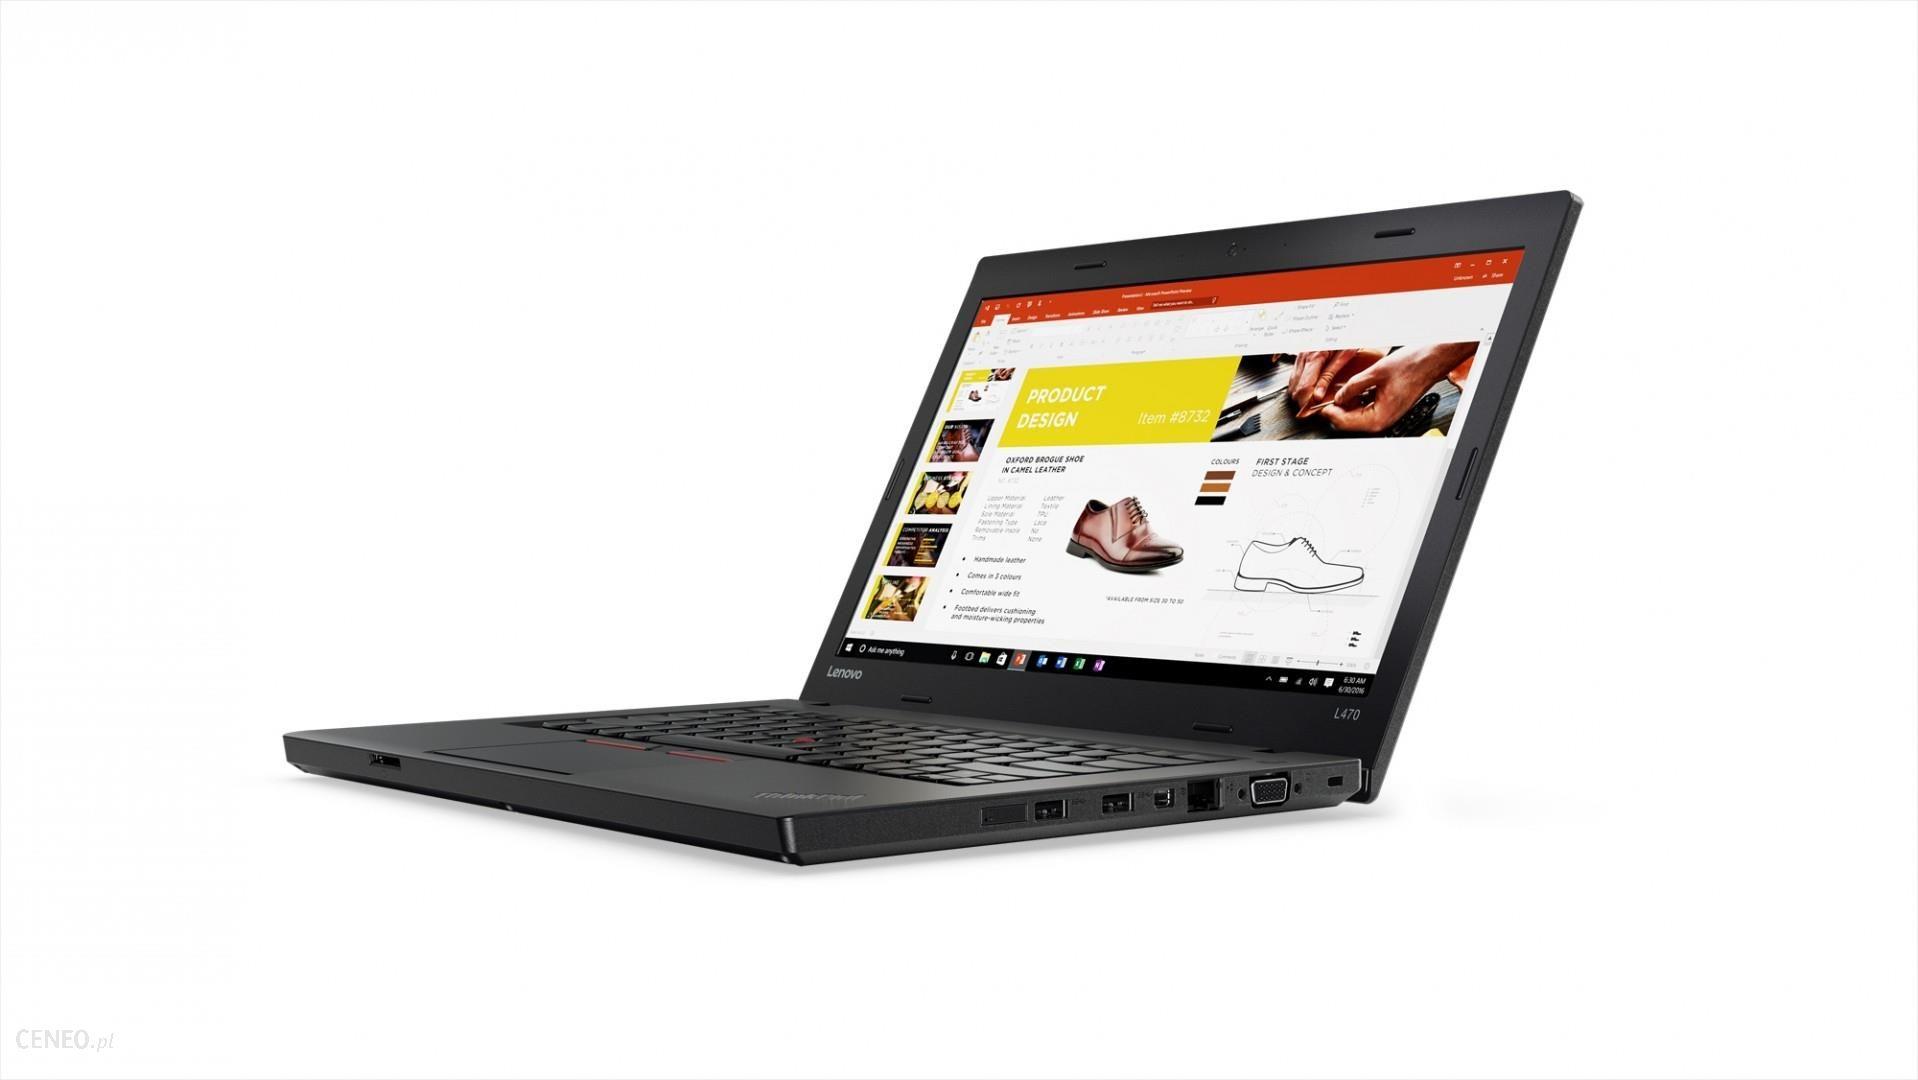 Laptop Lenovo ThinkPad L470 20J4000QPB zdjęcie 1